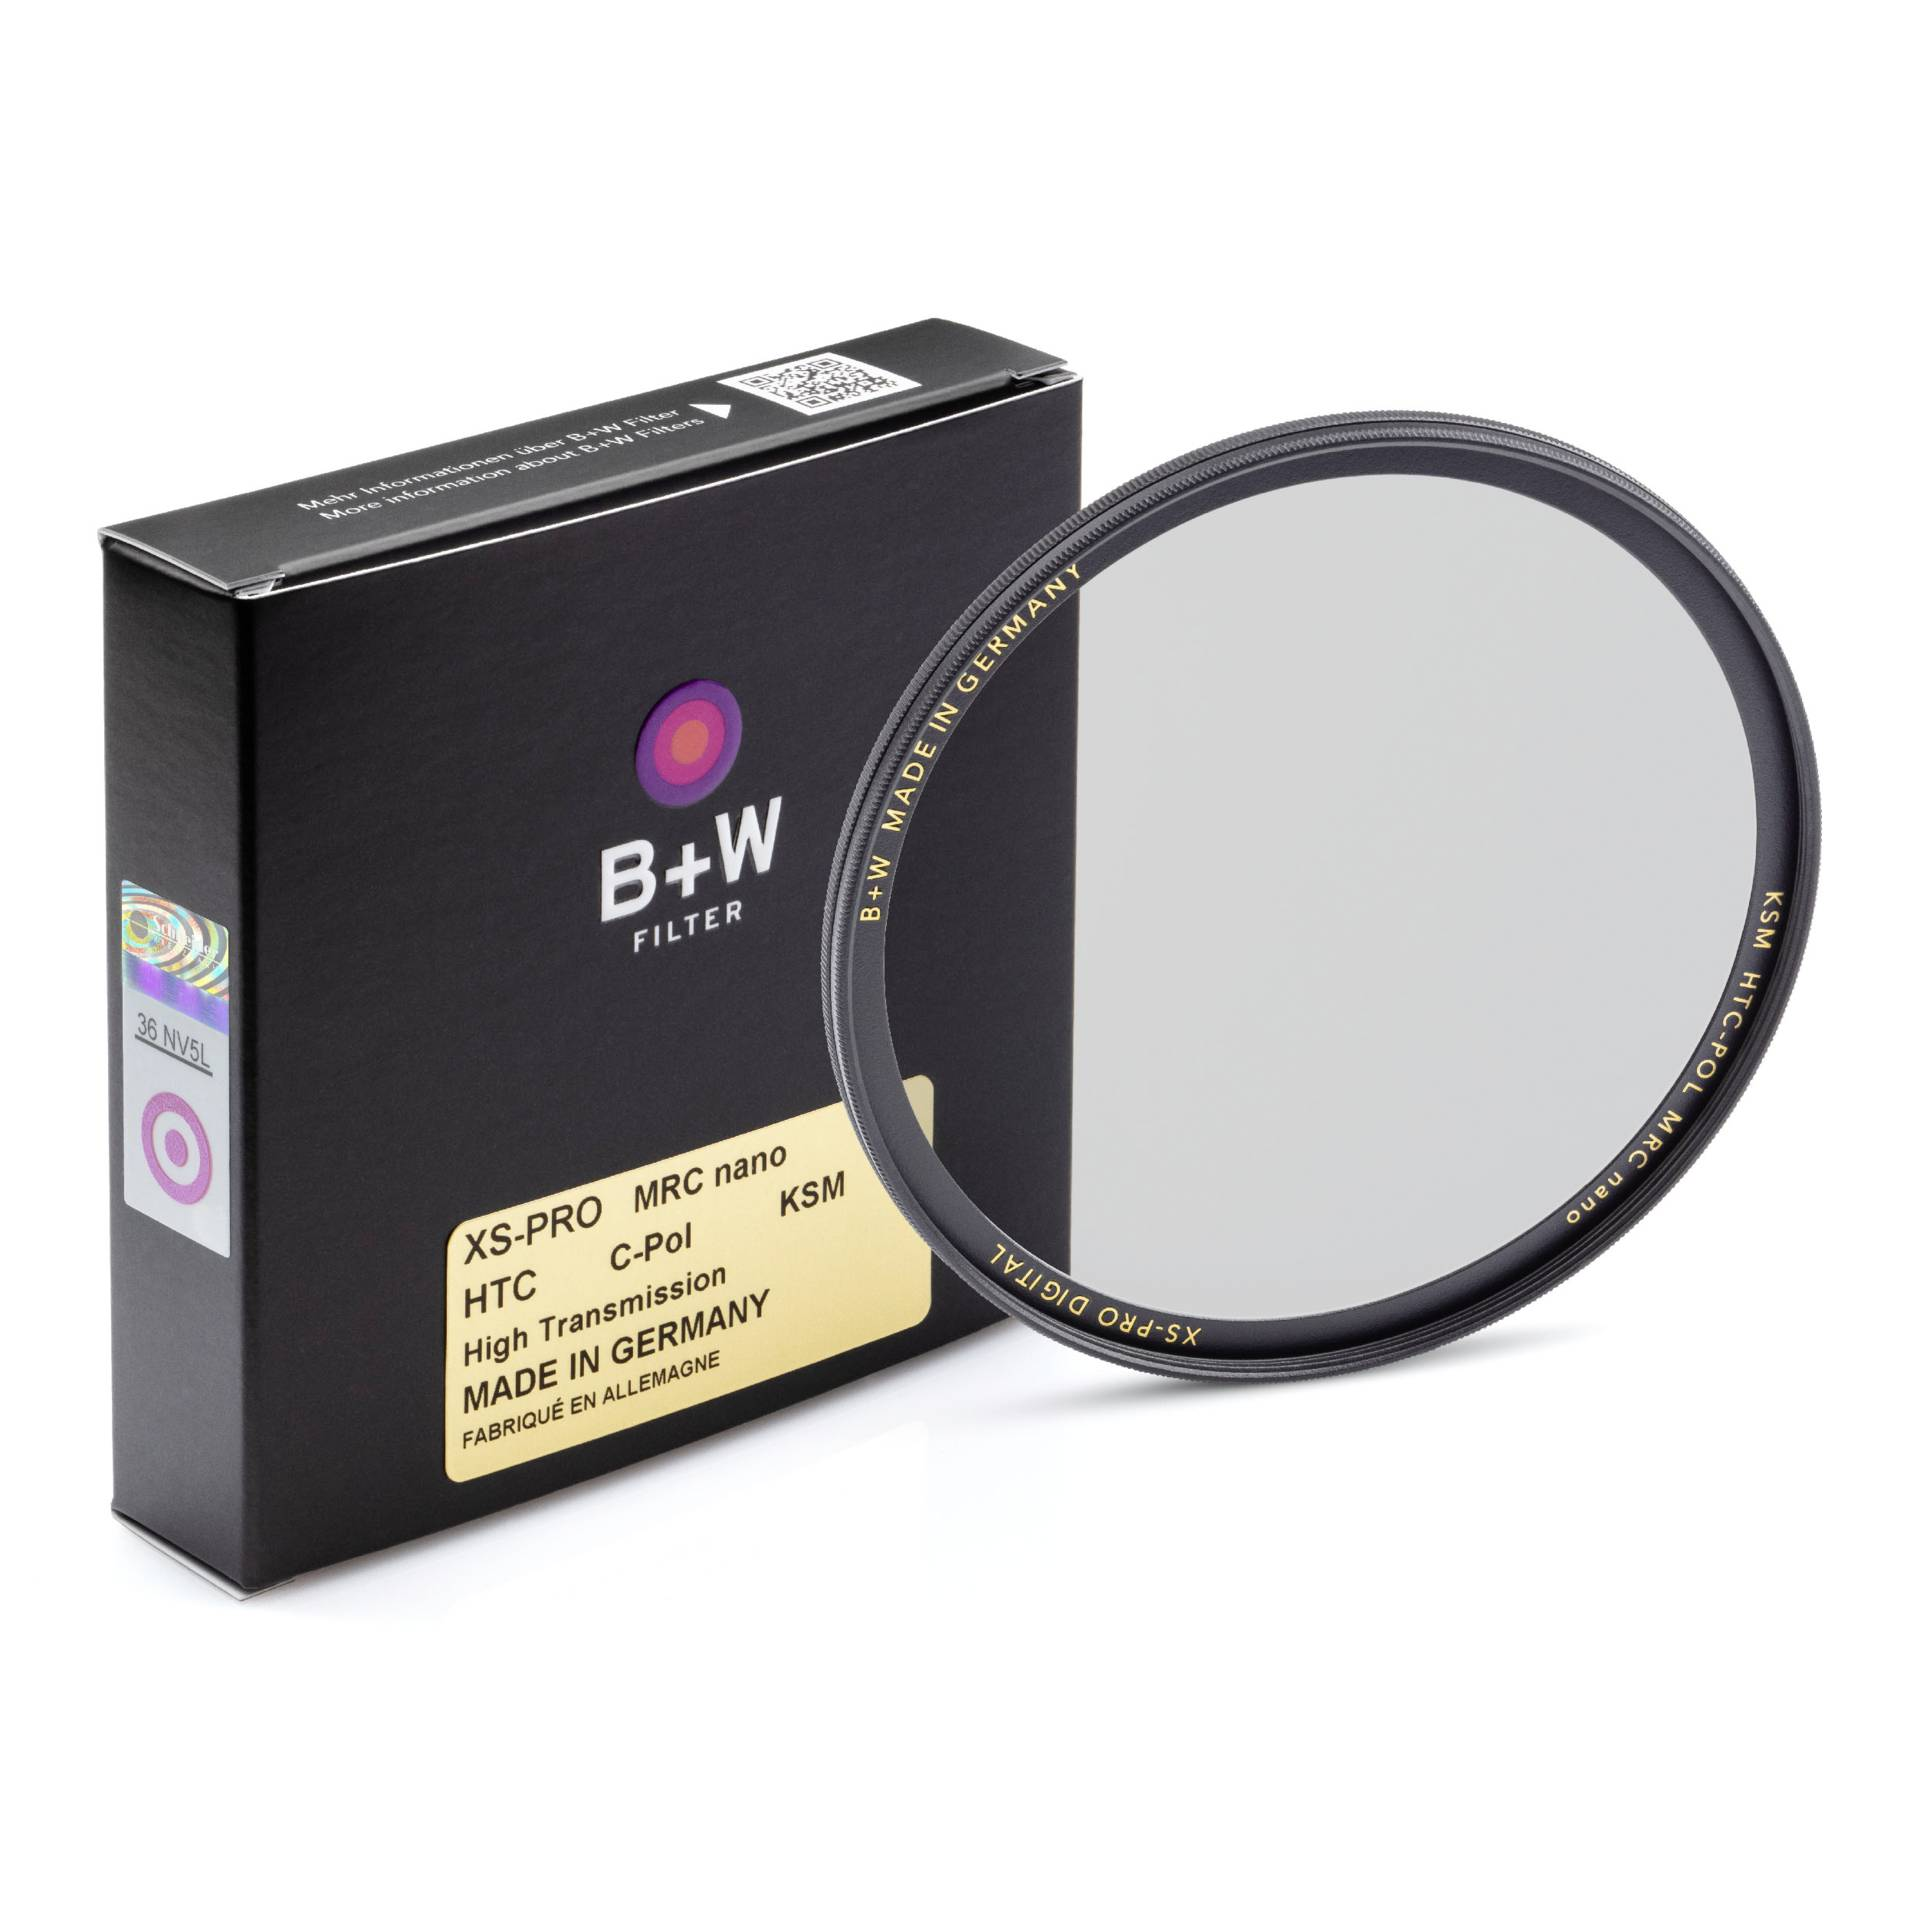 B+W XS-Pro Digital HTC Circular Polarizer Kasemann MRC nano 39mm